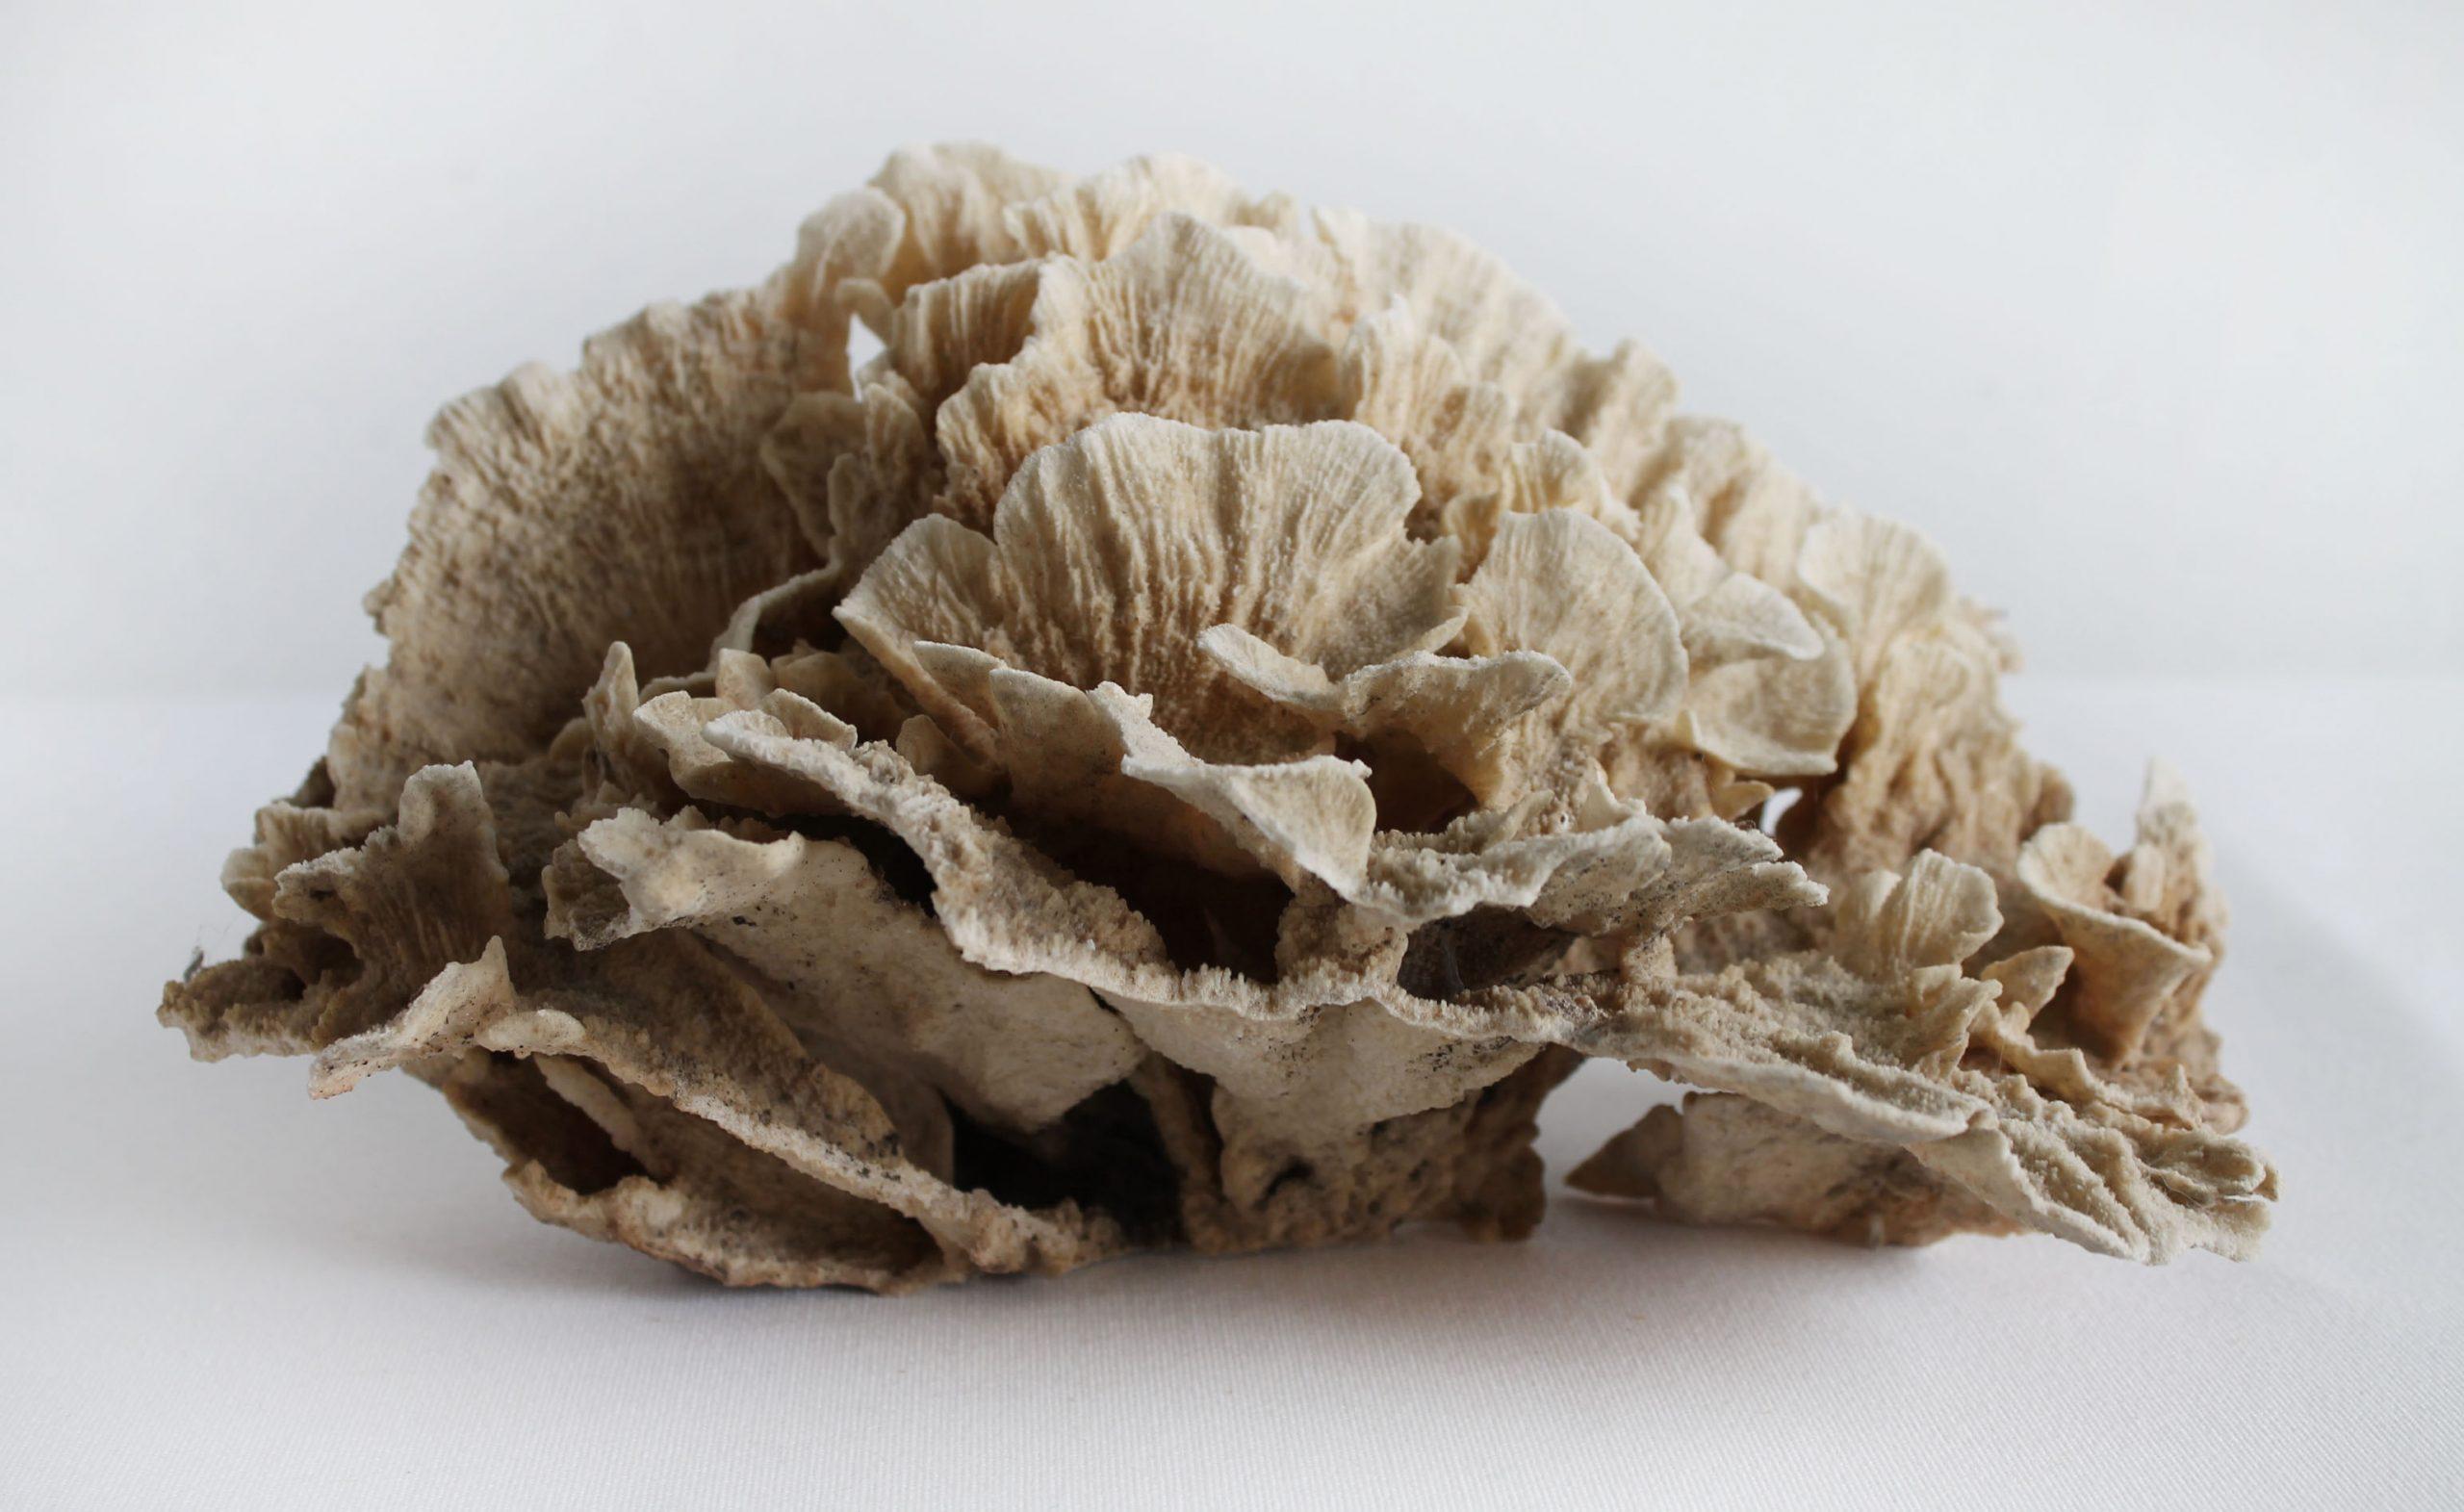 Real Natural Brown Lace Coral